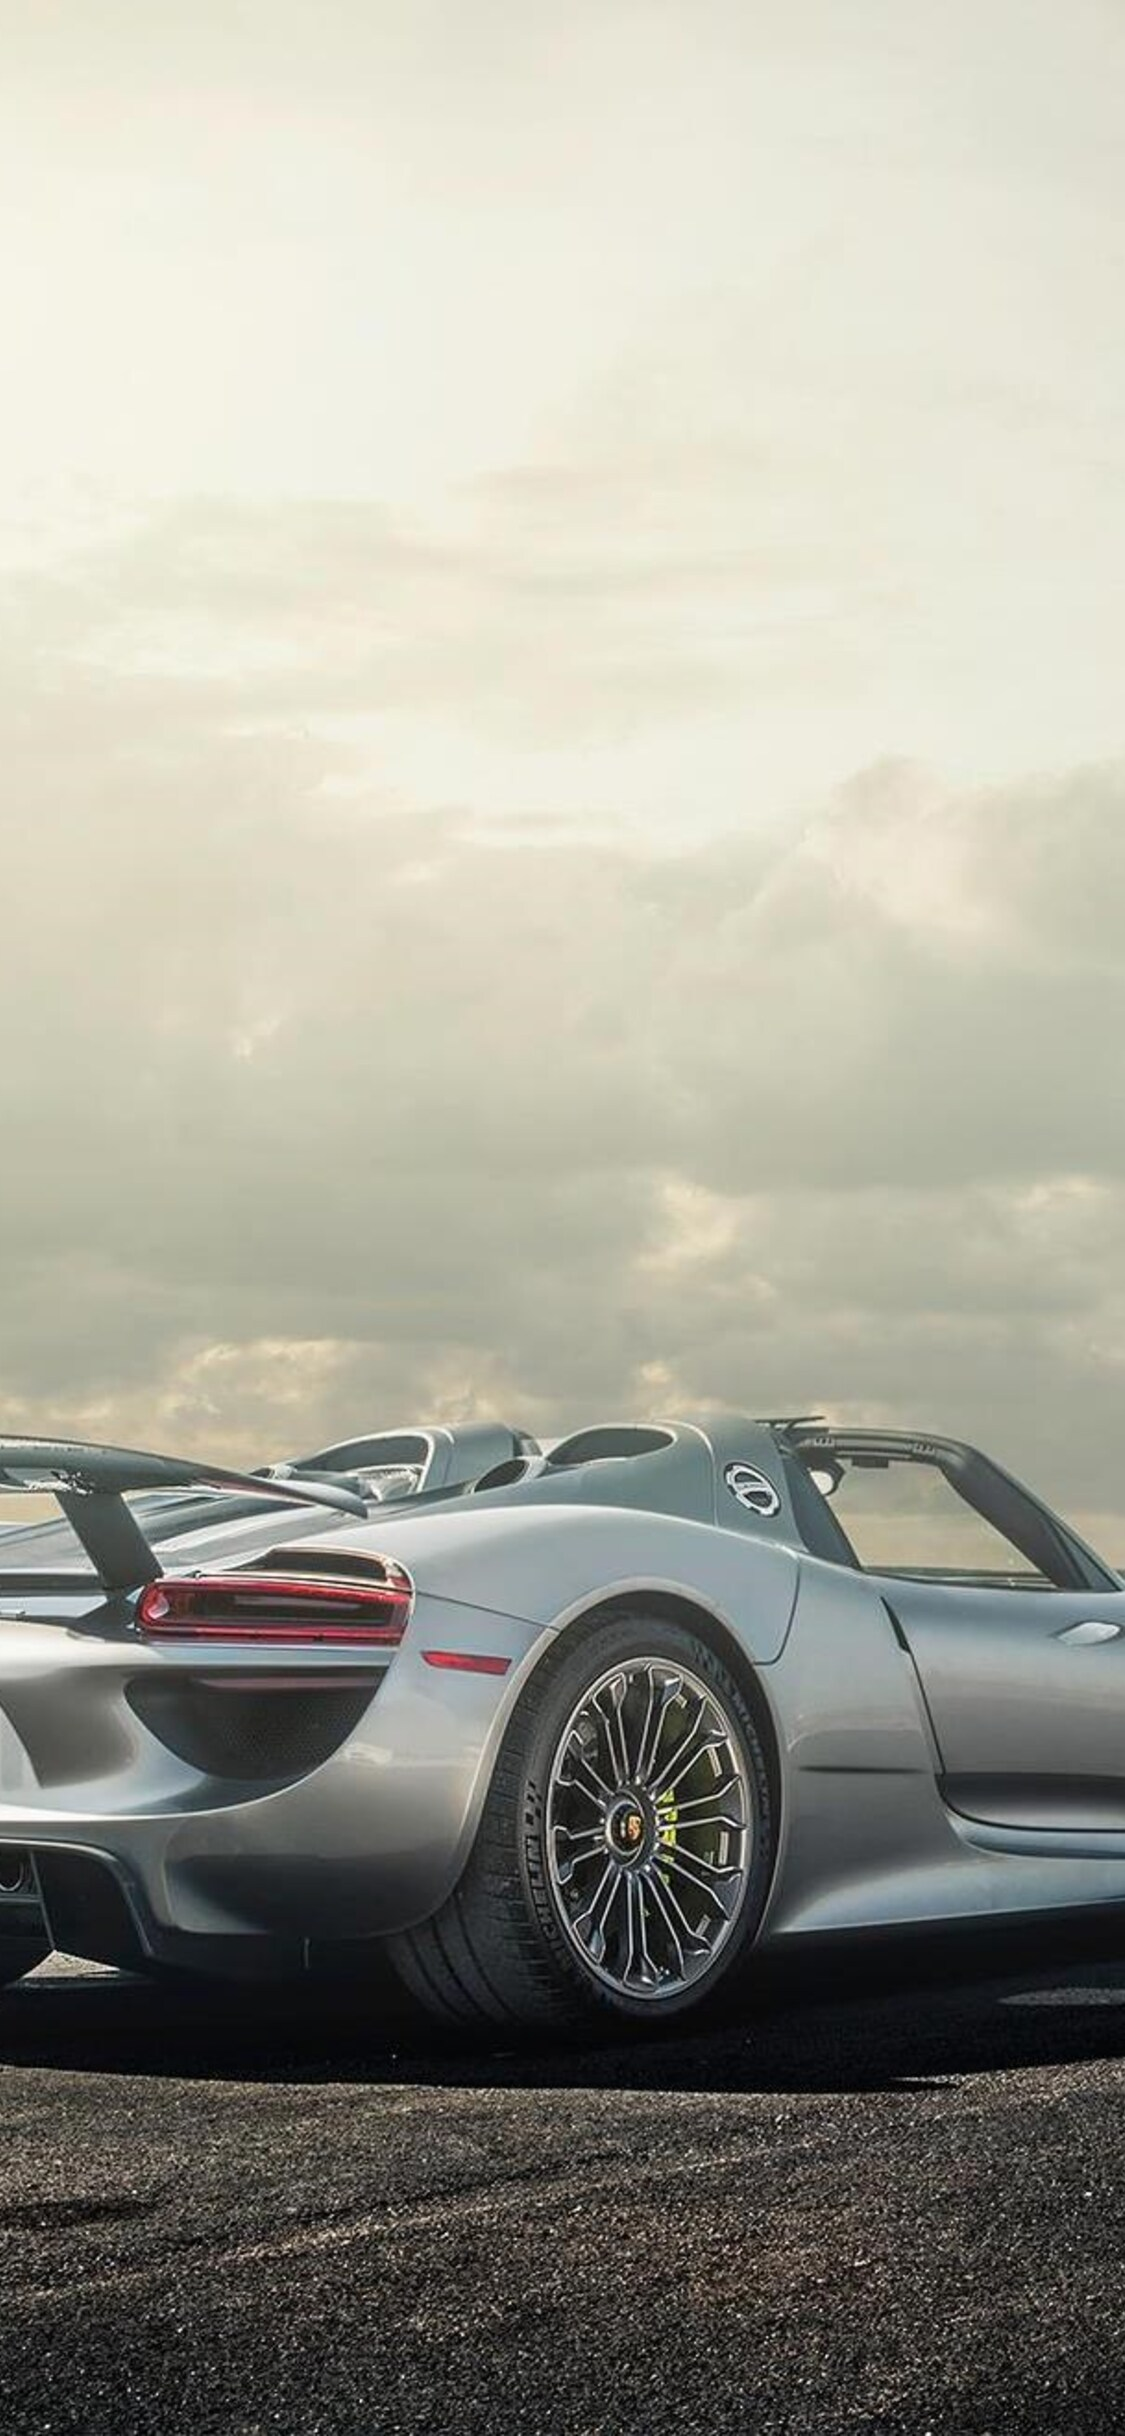 1125x2436 Porsche 918 Spyder 2 Iphone Xs Iphone 10 Iphone X Hd 4k